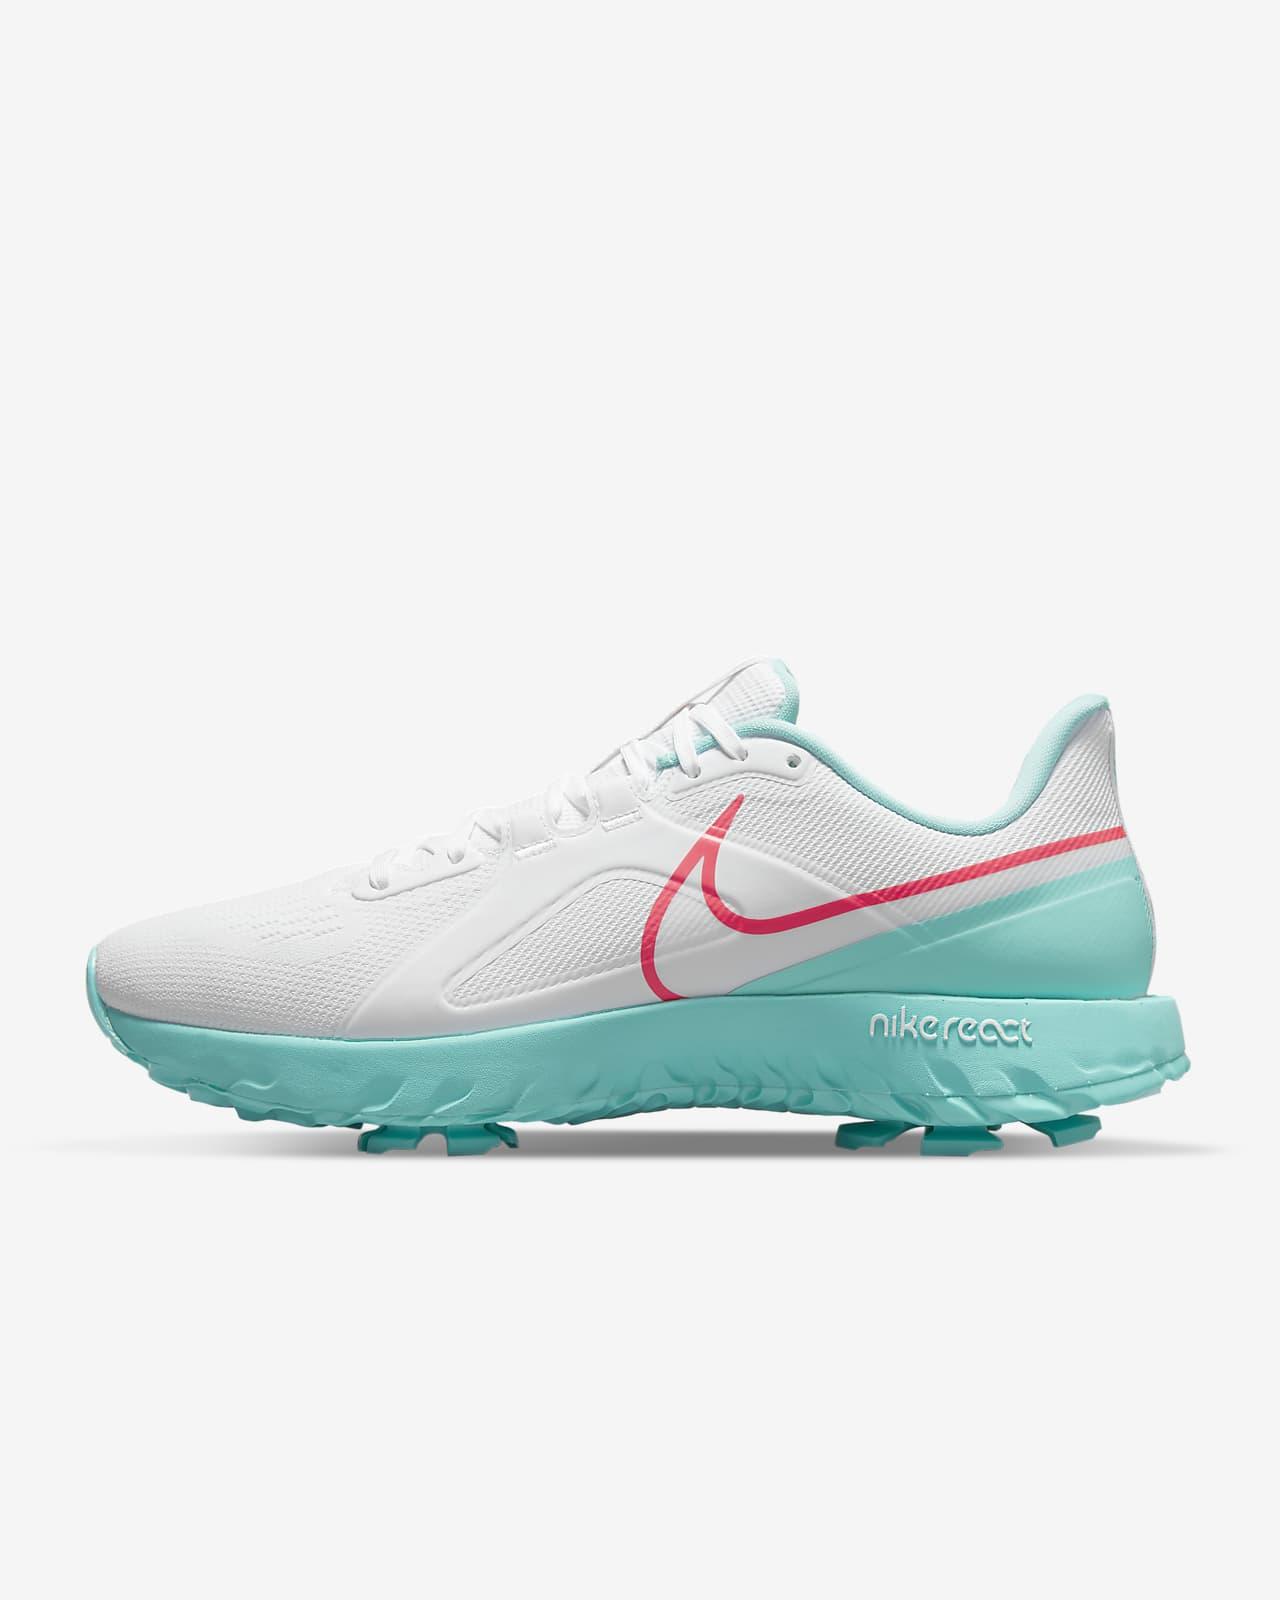 Nike React Infinity Pro Golf-sko